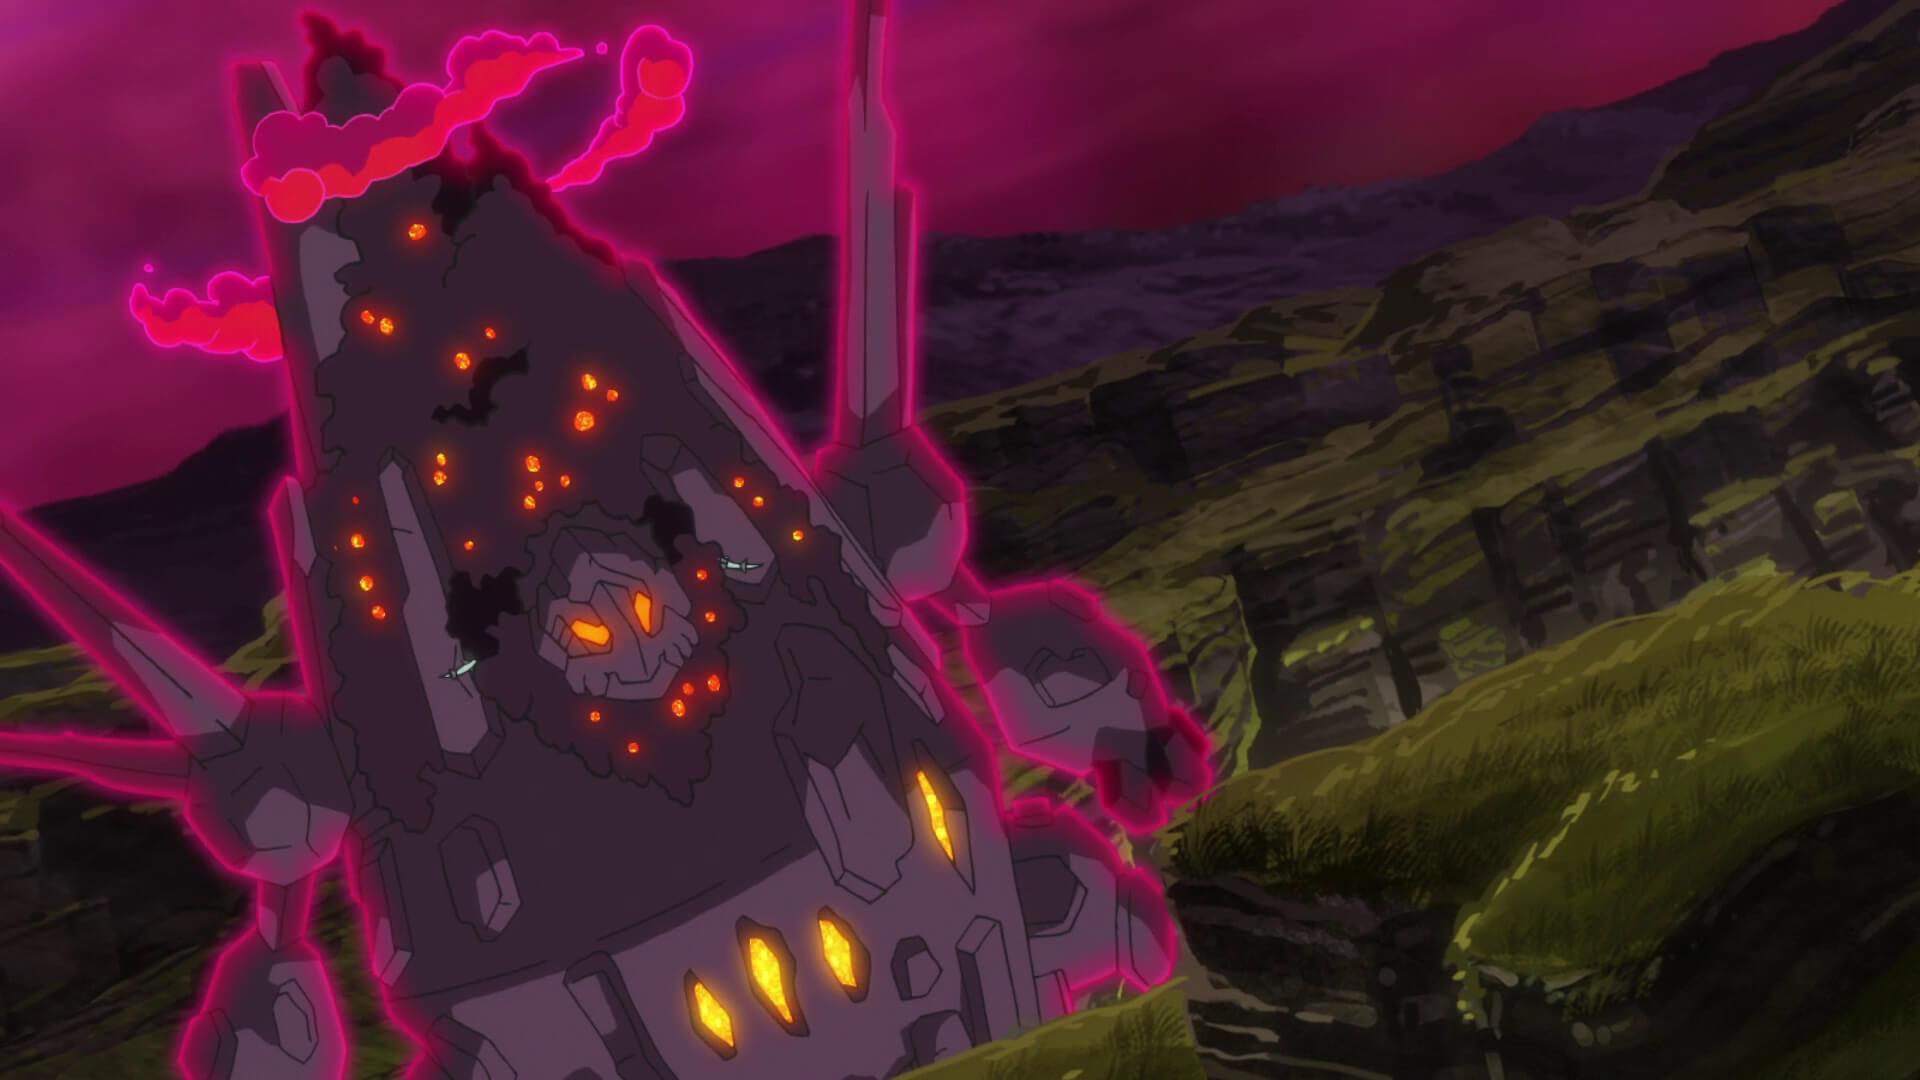 Gigantamax_Coalossal_anime NintendOn